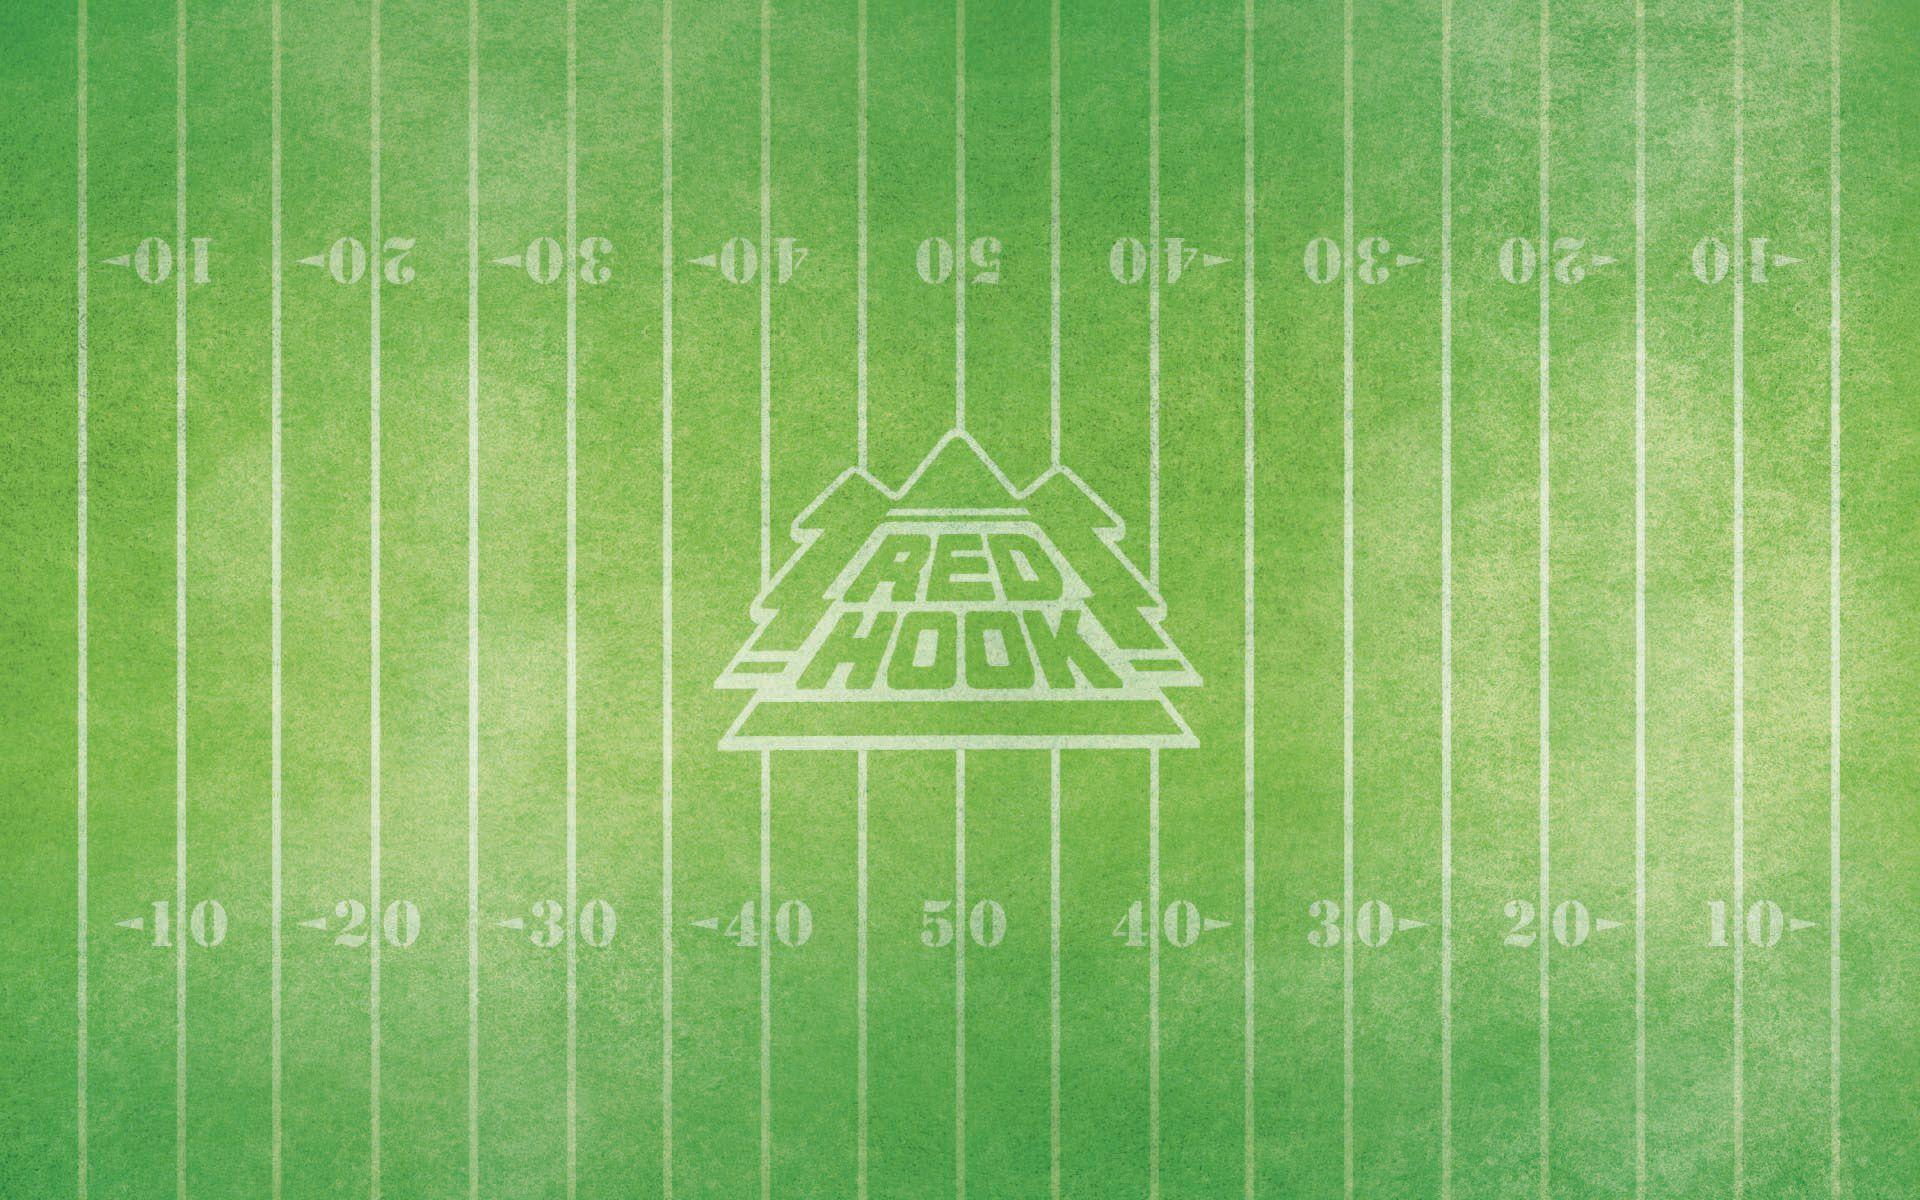 Football Field Wallpapers - Wallpaper Cave